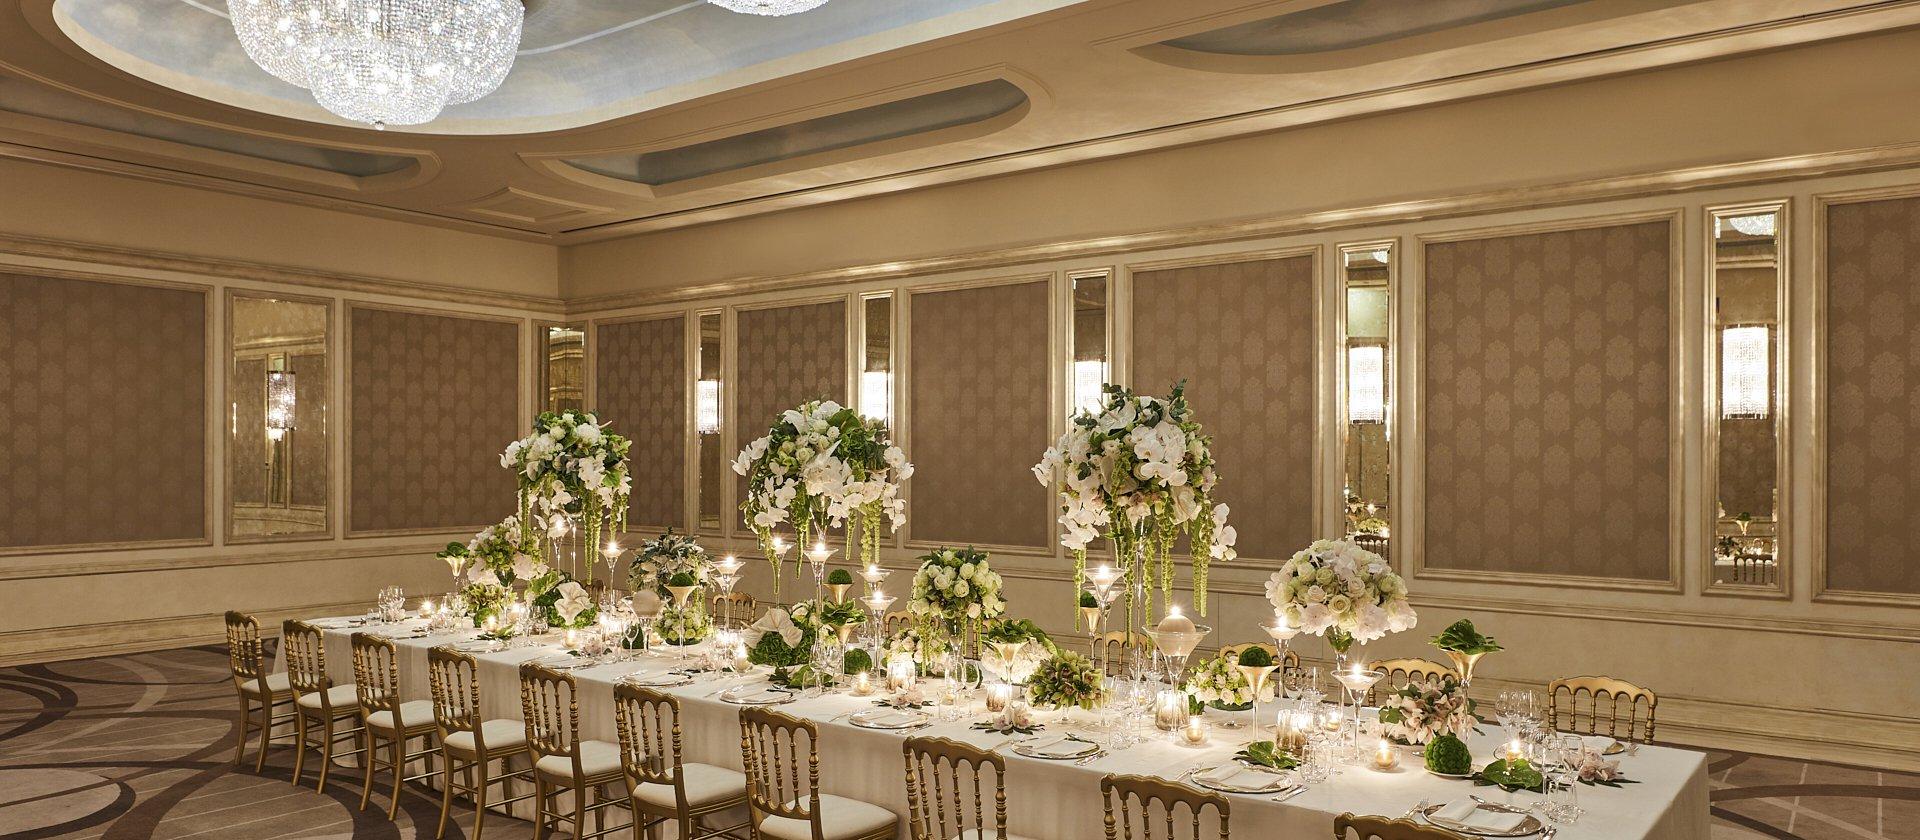 Hotel Principe di Savoia event spaces Cristalli space, gala dinner